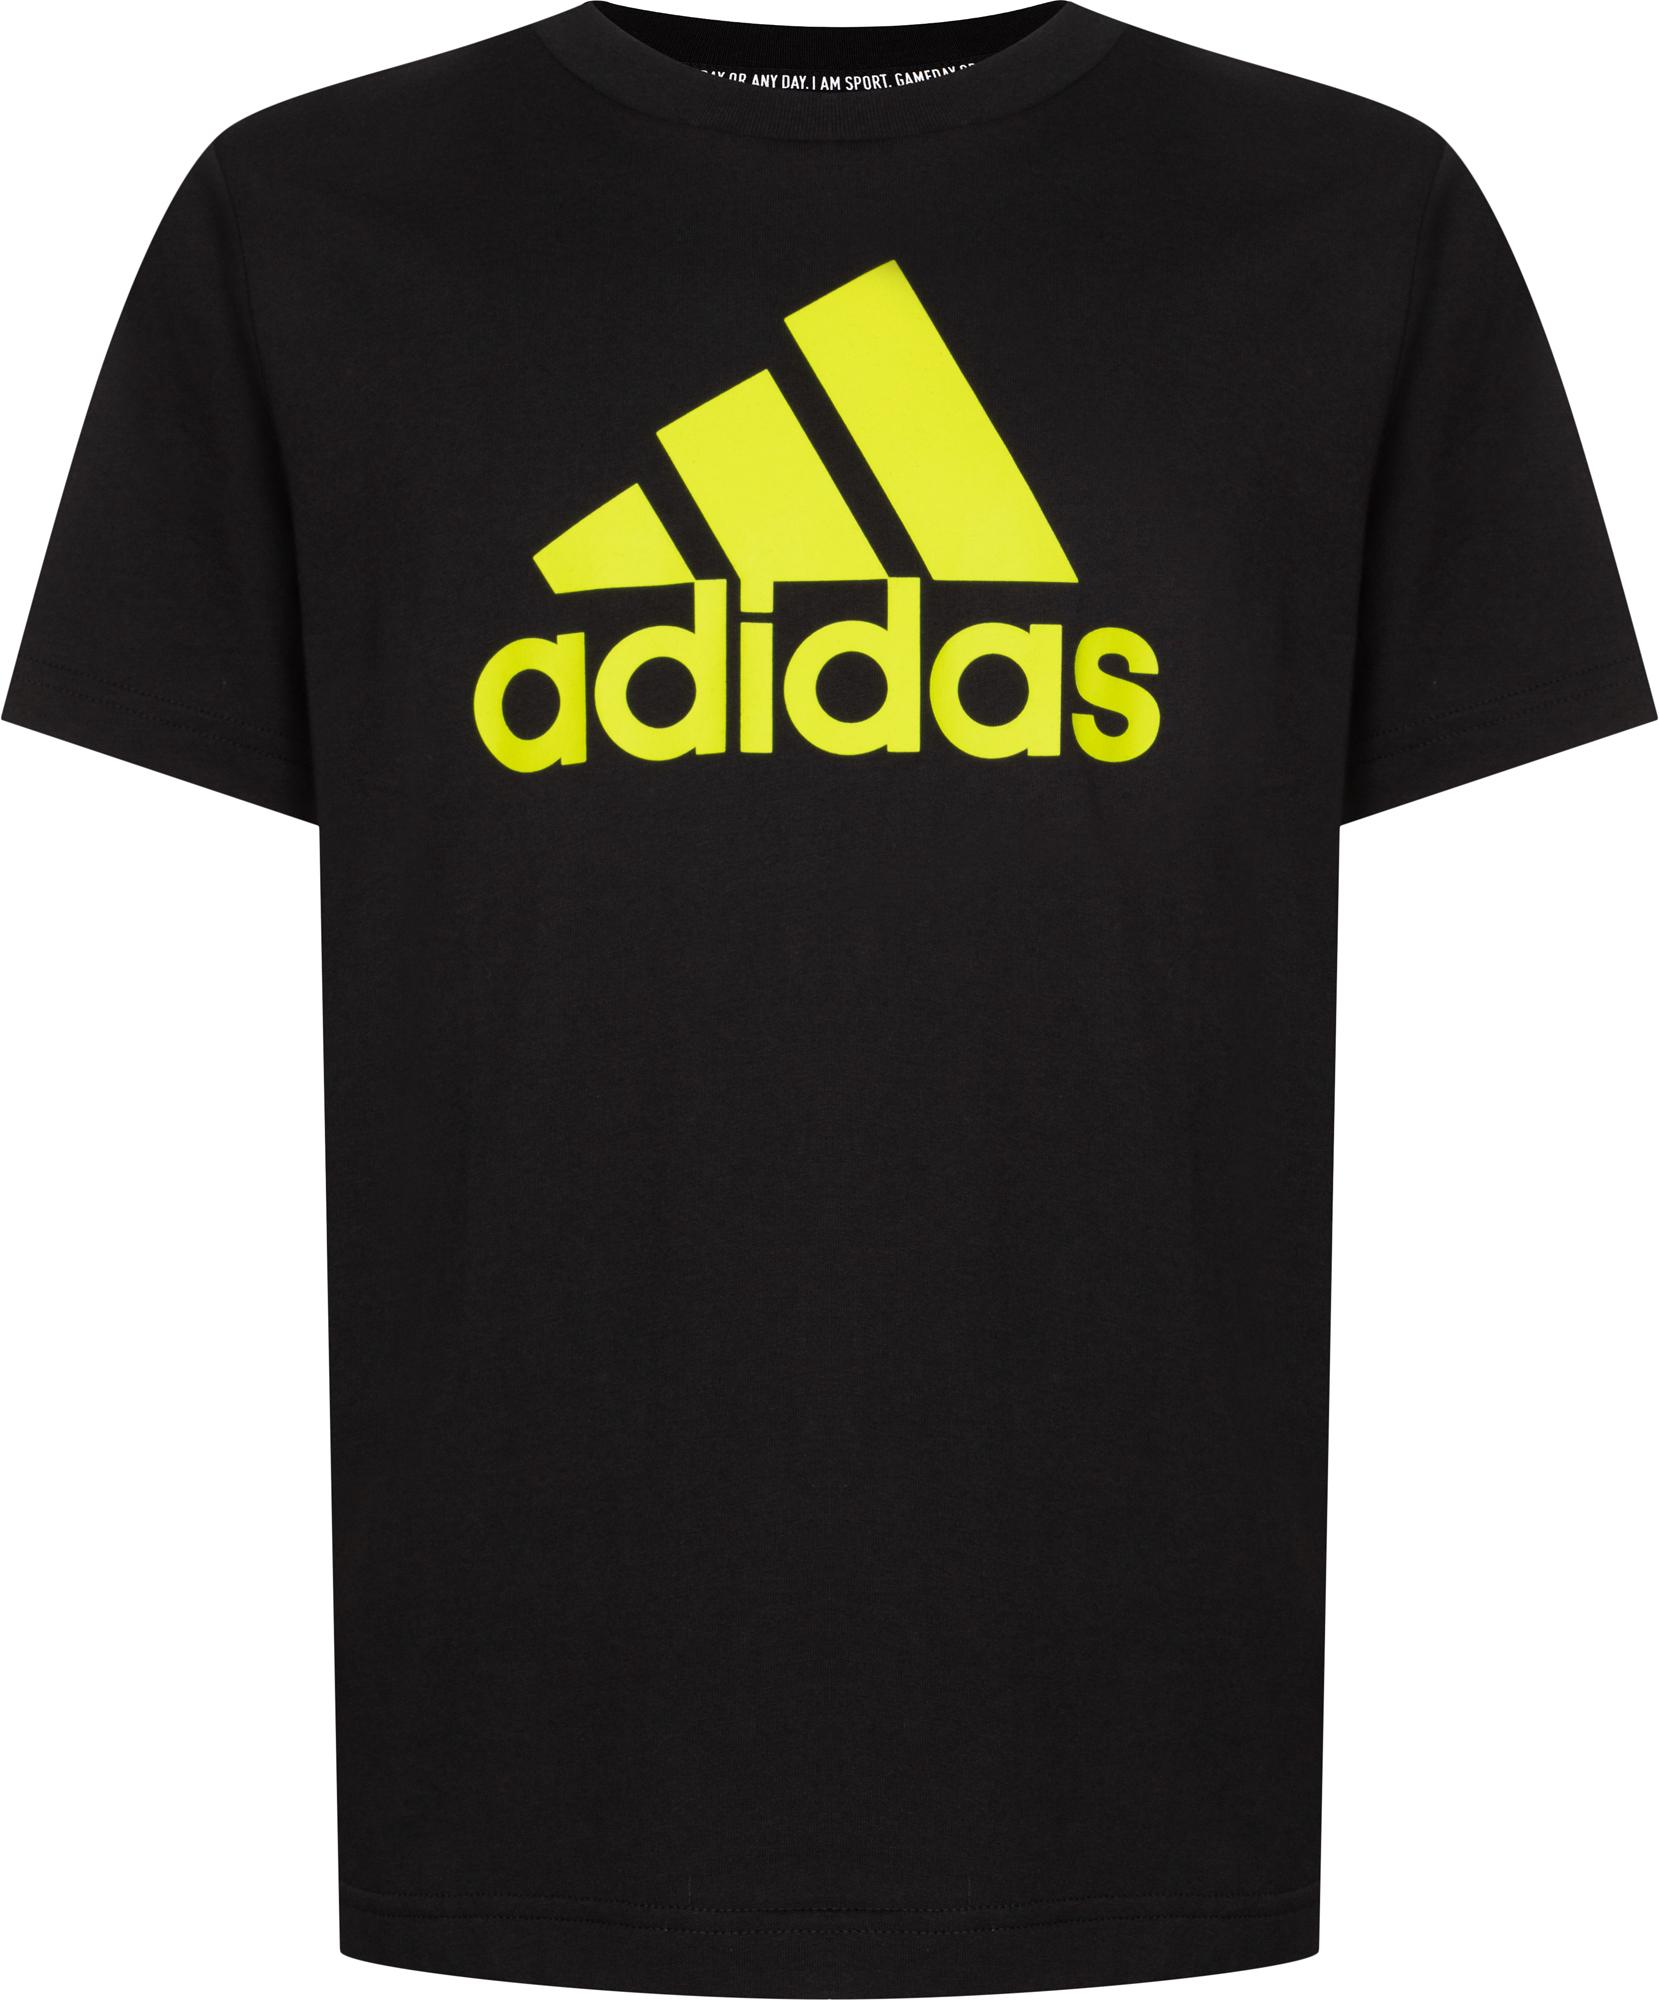 Adidas Футболка для мальчиков Adidas Must Haves Badge of Sport, размер 128 adidas футболка freelift grad linkha